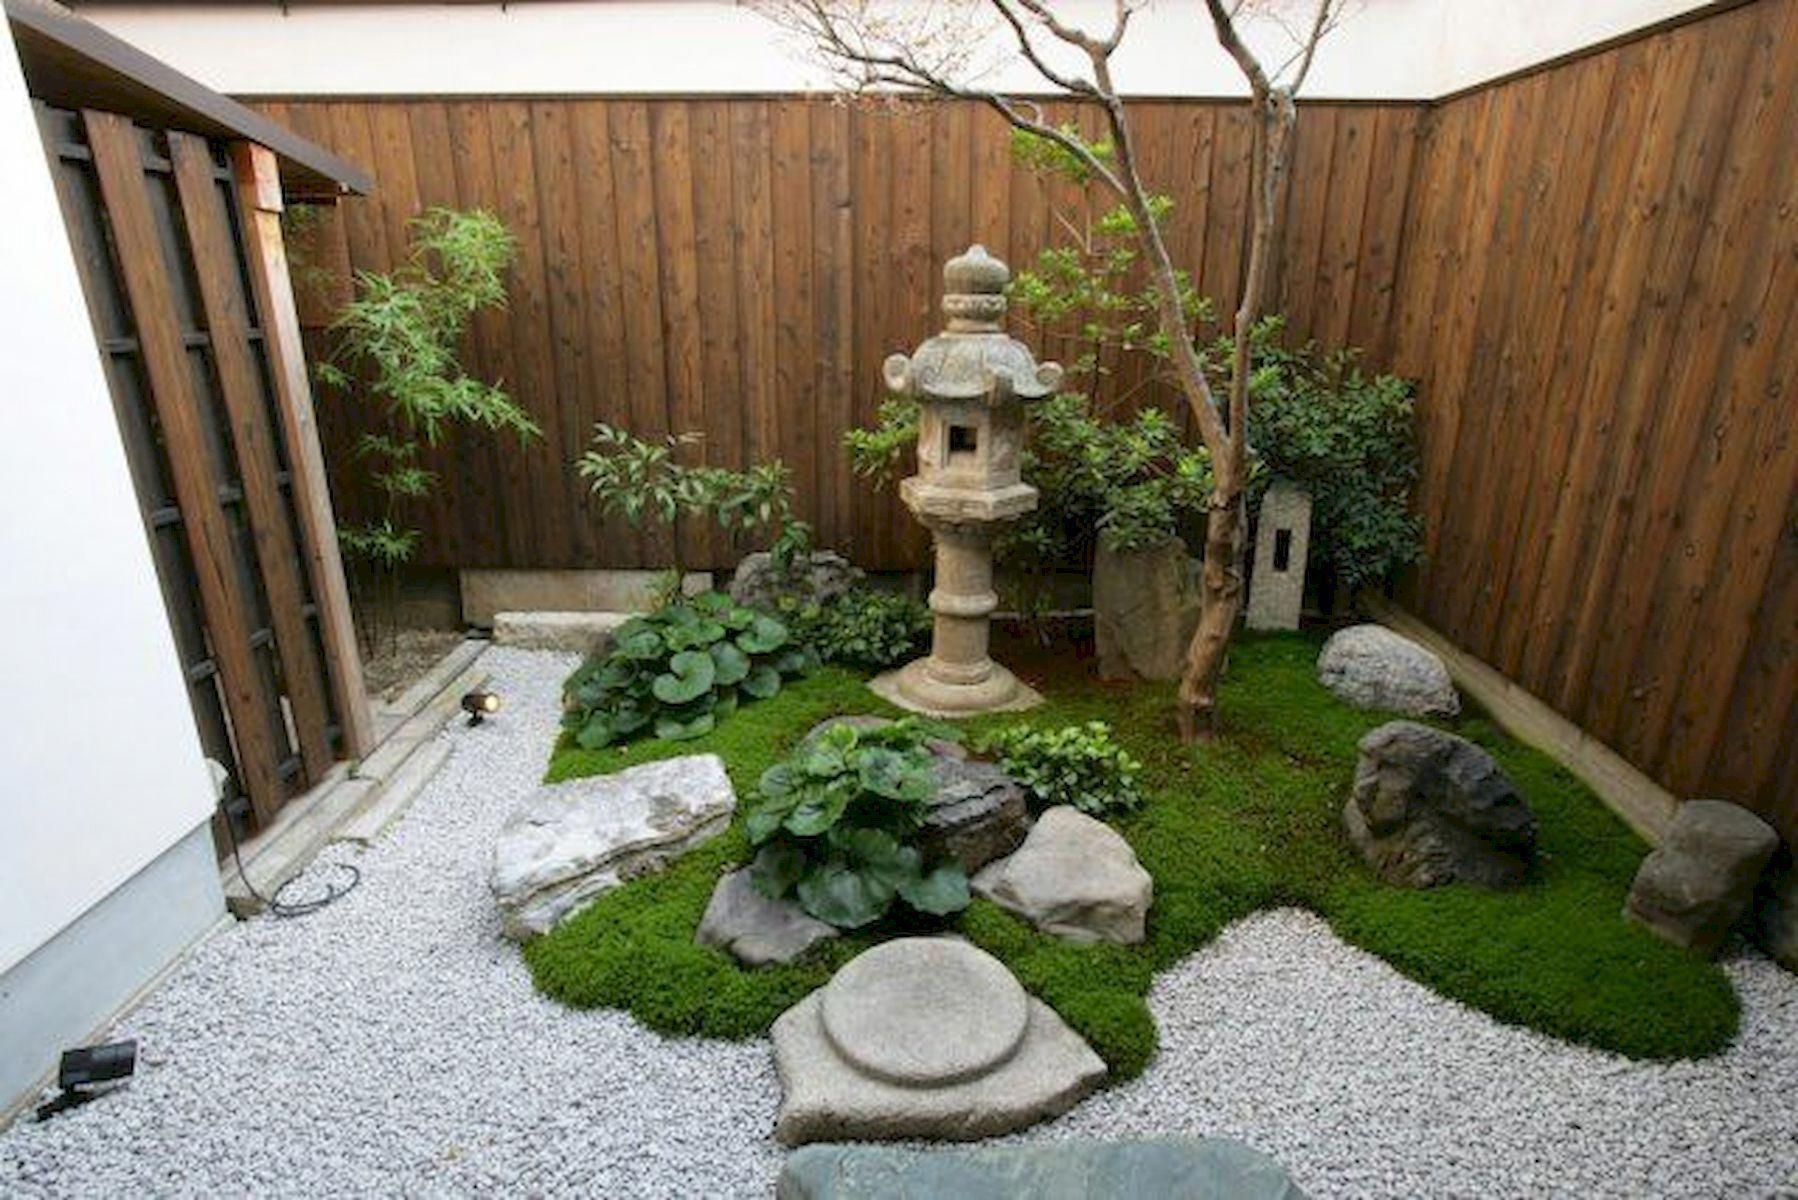 Miniature Japanese Zen Garden Zengarden Small Japanese Garden Zen Garden Design Japanese Garden Design